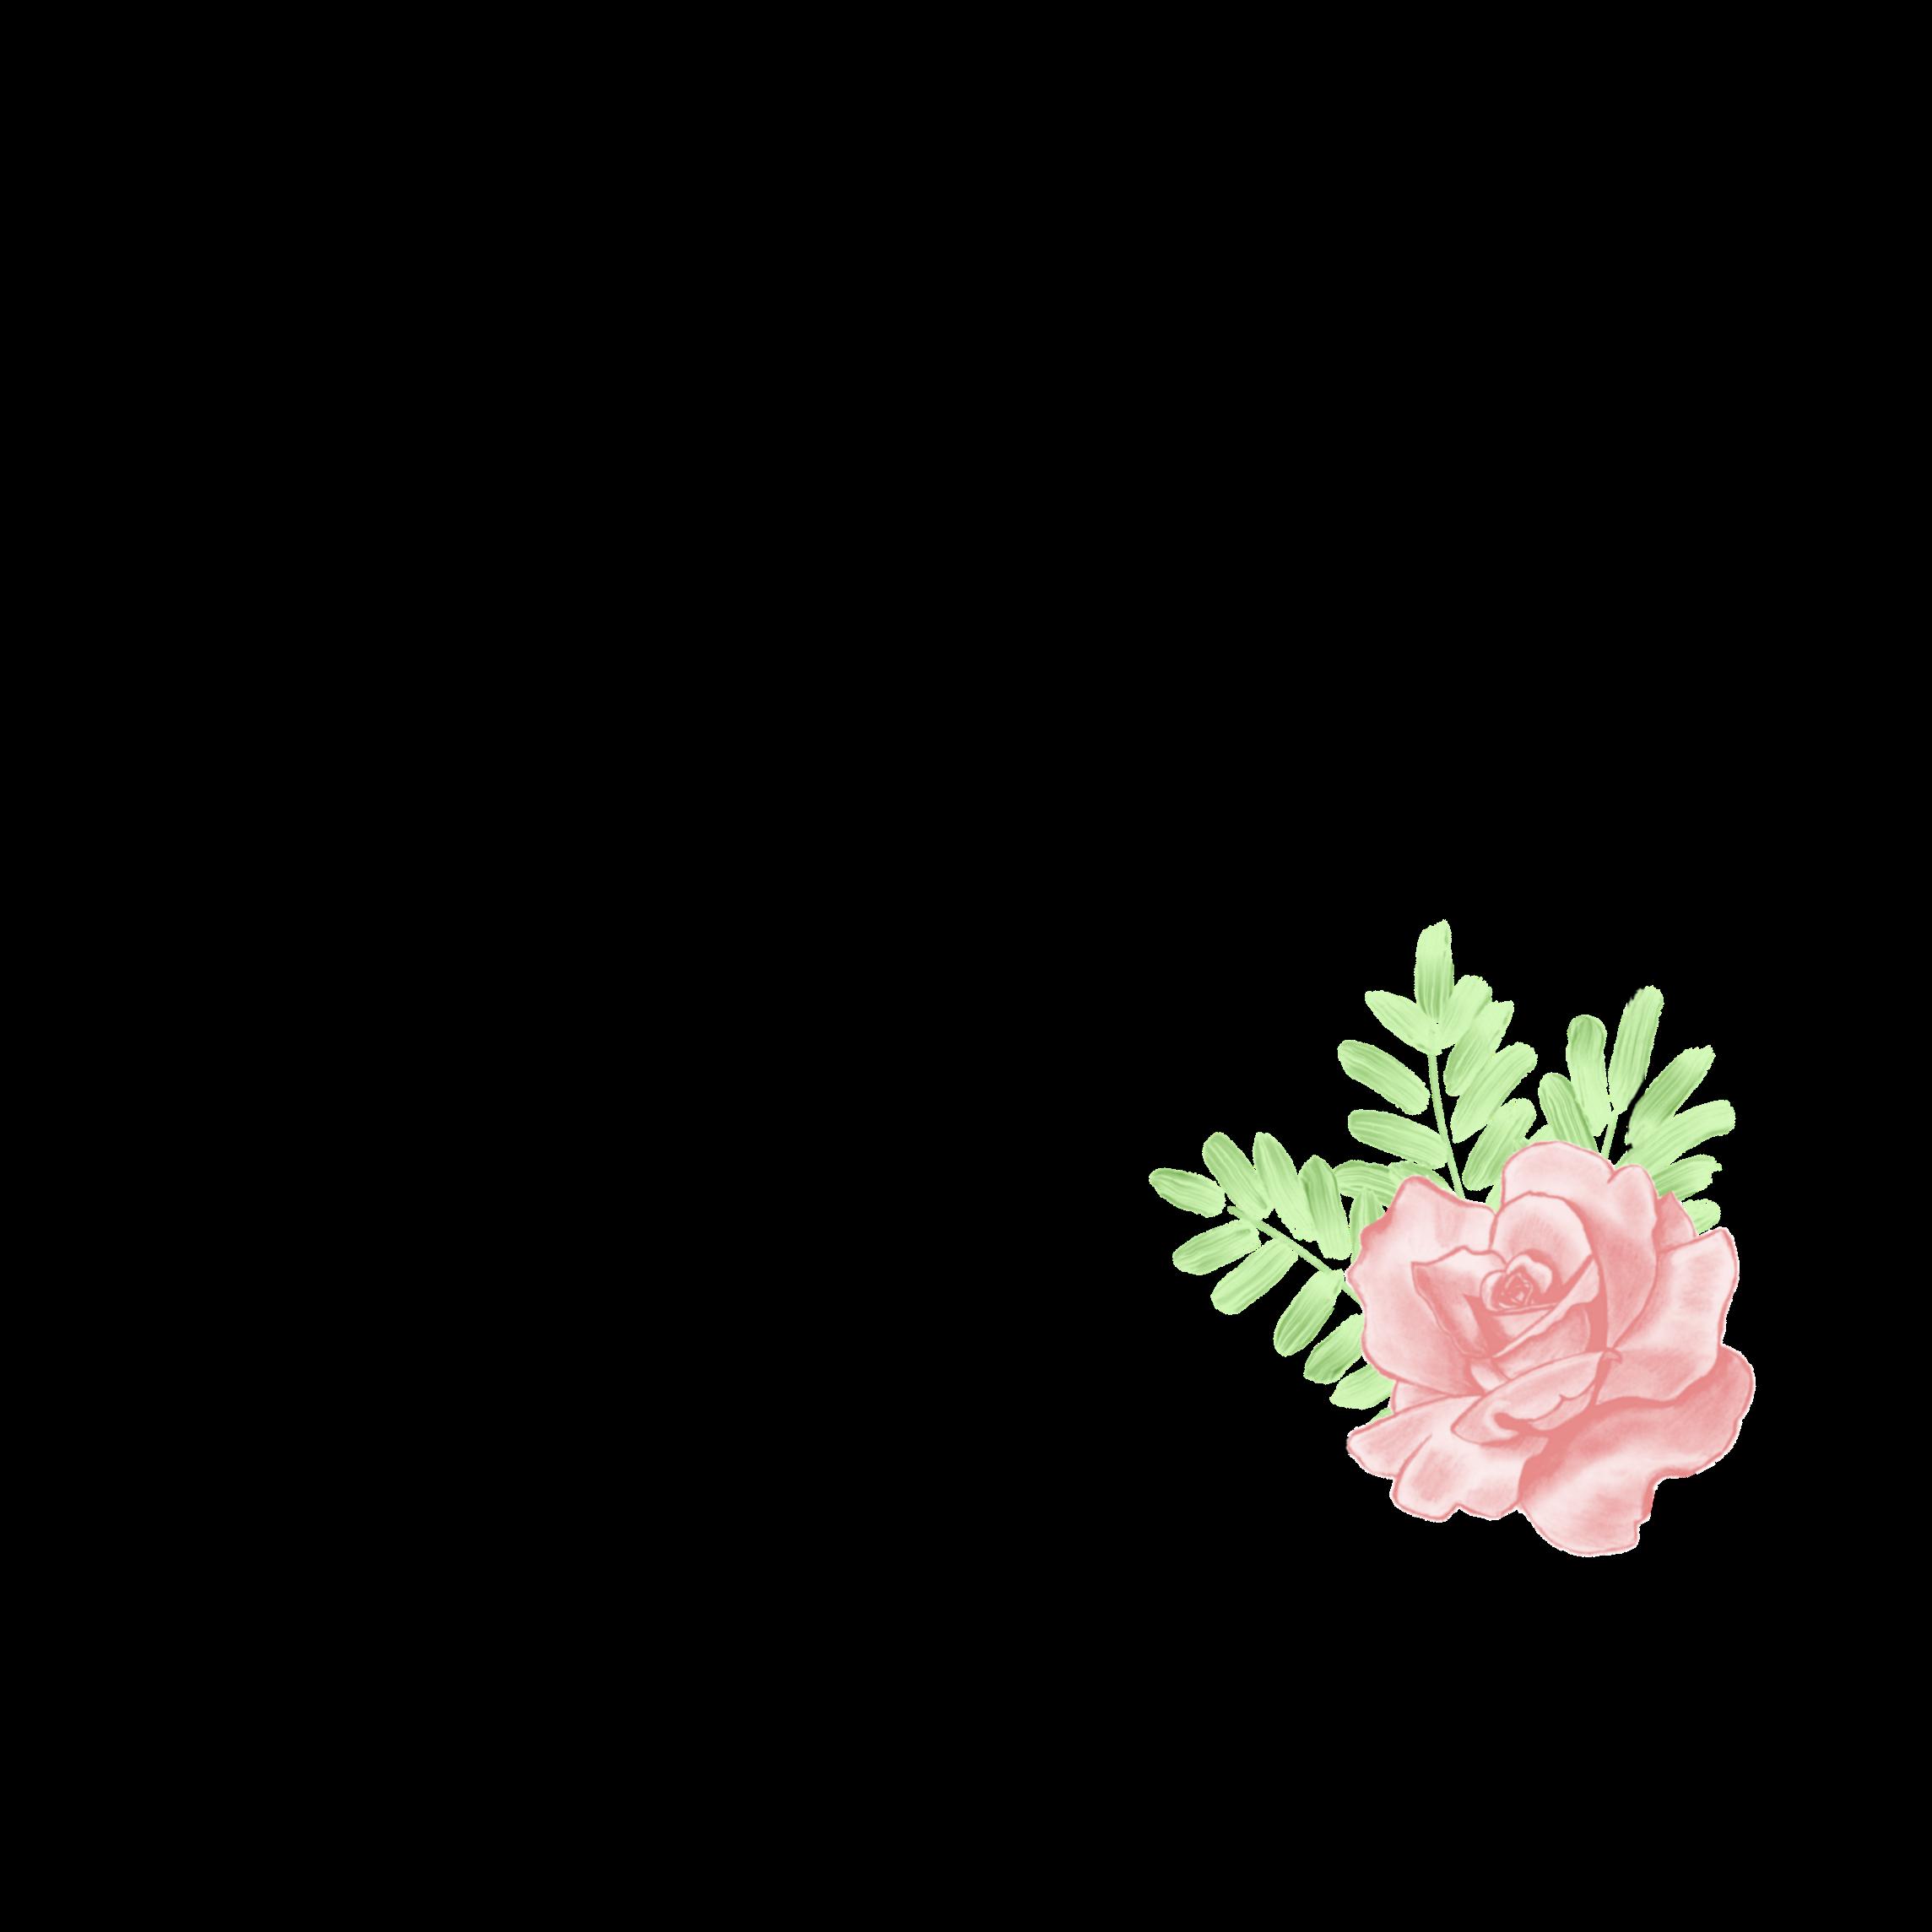 Frame Tumblr Flower Flowerframe Tumblrframe Becreative